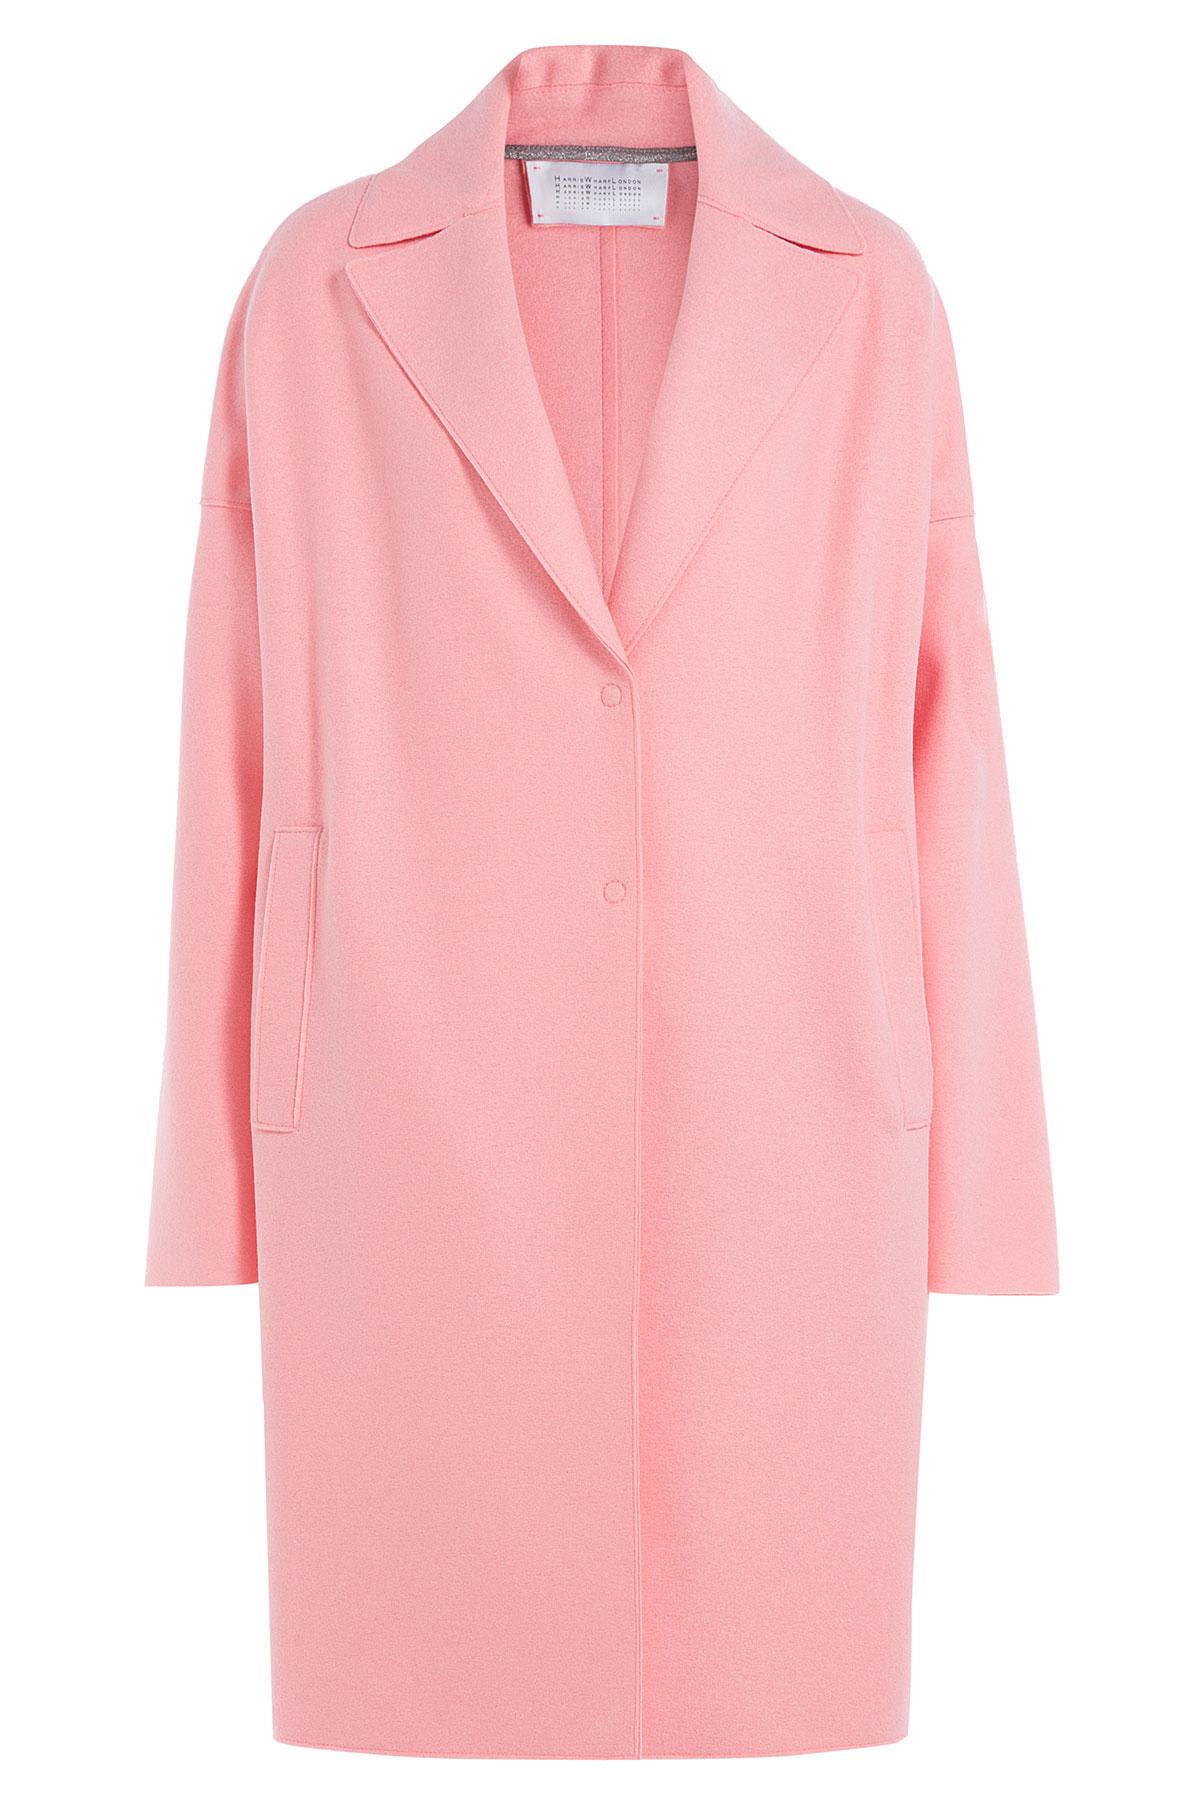 Harris wharf london Felted Wool Coat - Pink in Pink | Lyst